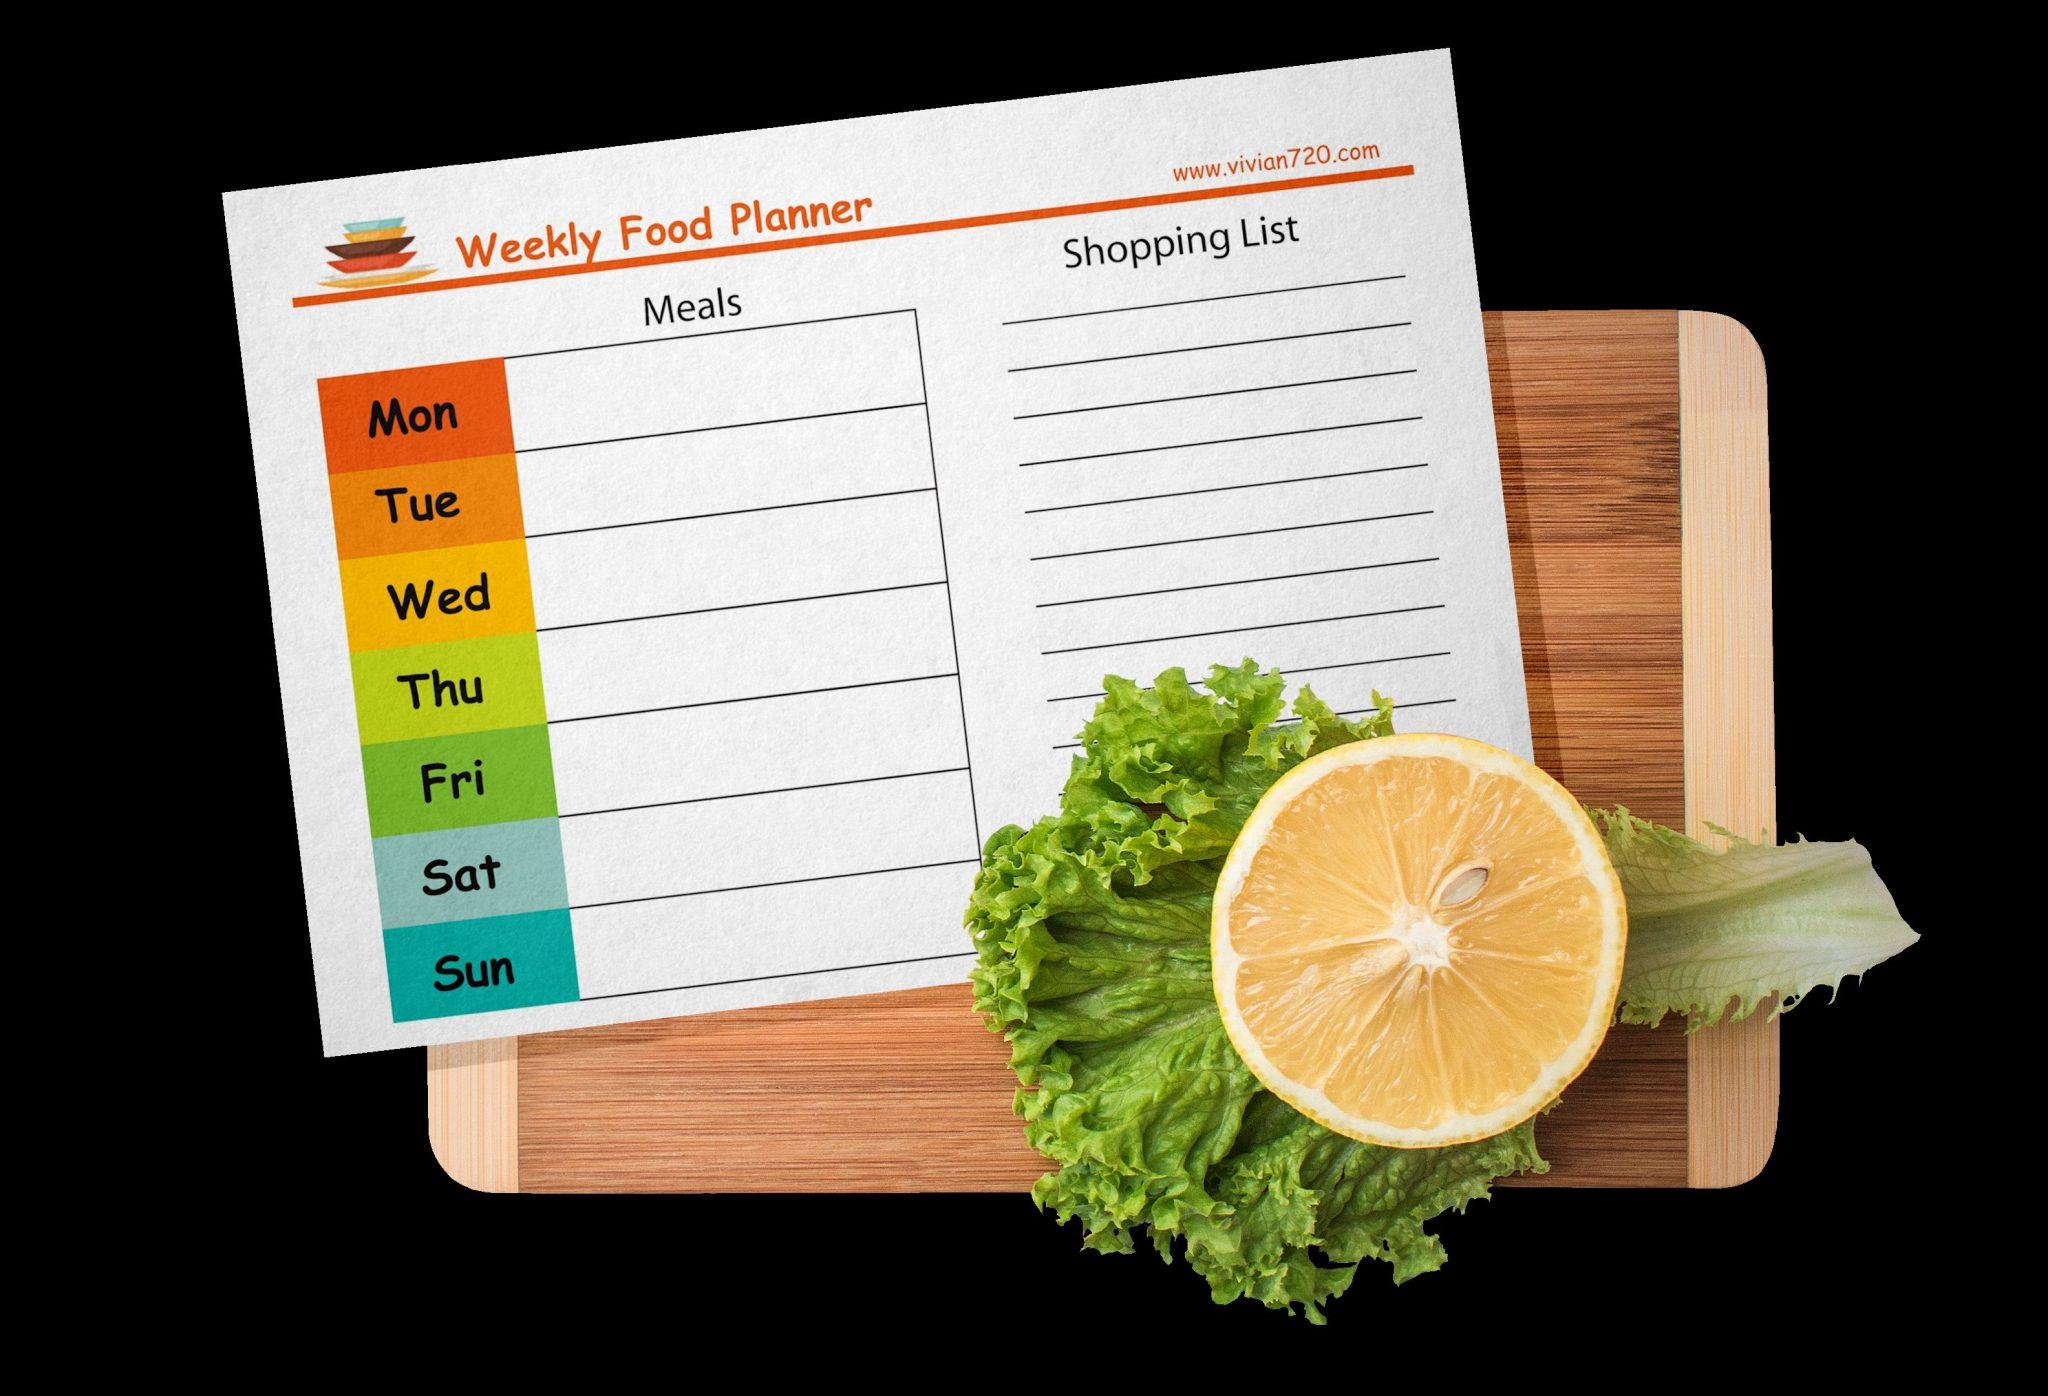 Food Planner-shopping List